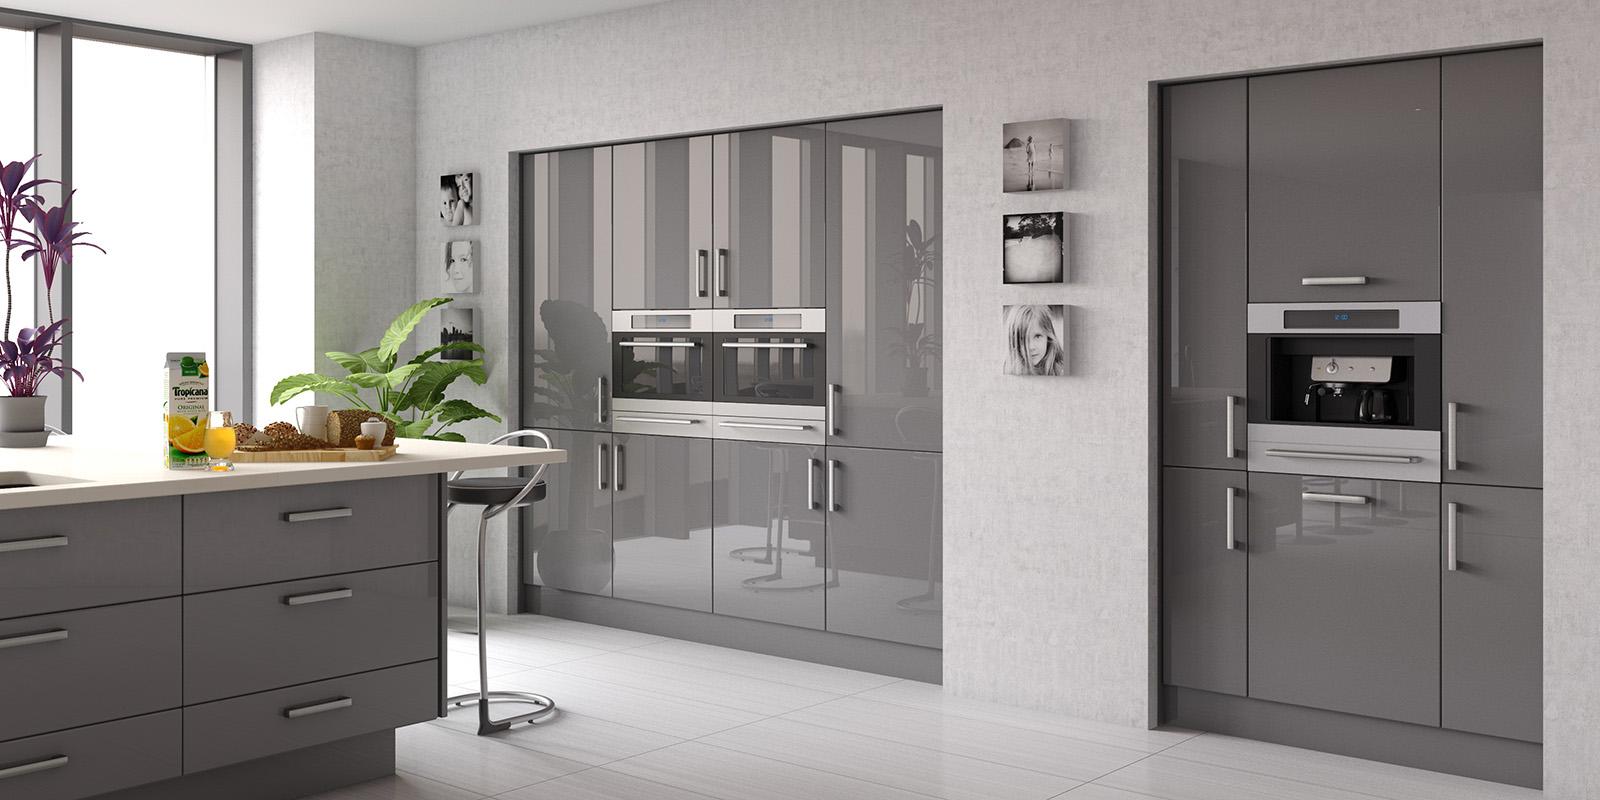 contemp-kitchen-grey-gloss-full